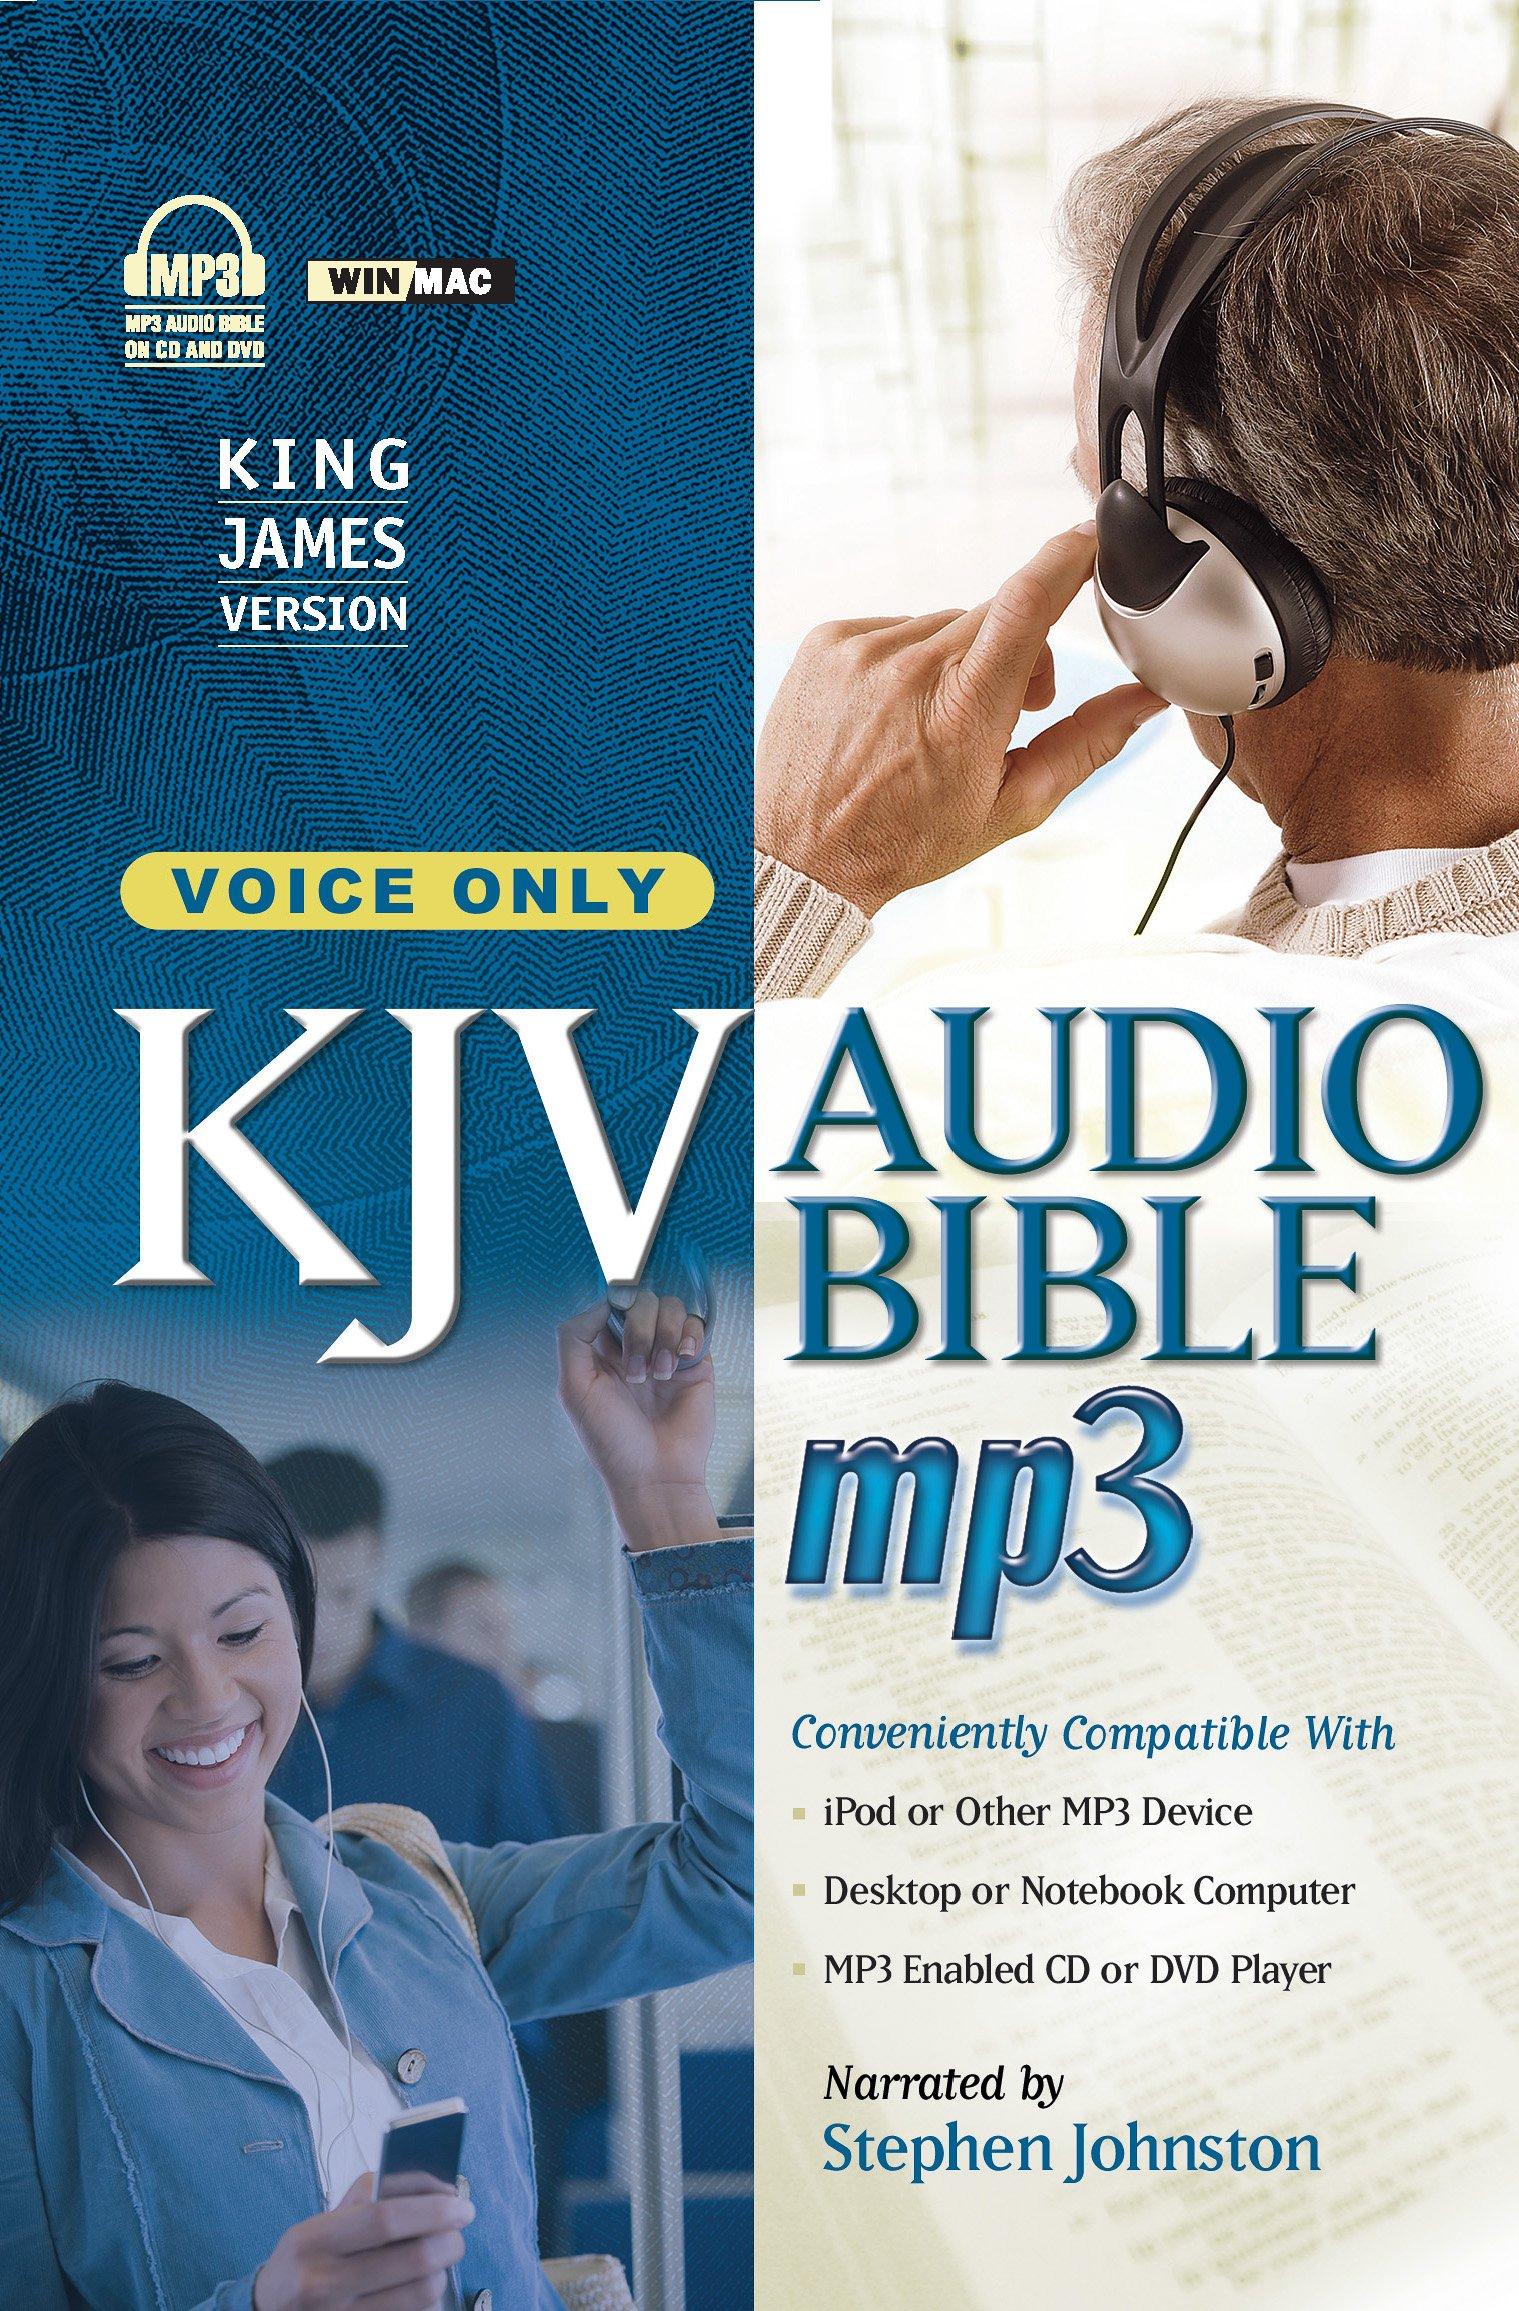 KJV Audio Bible